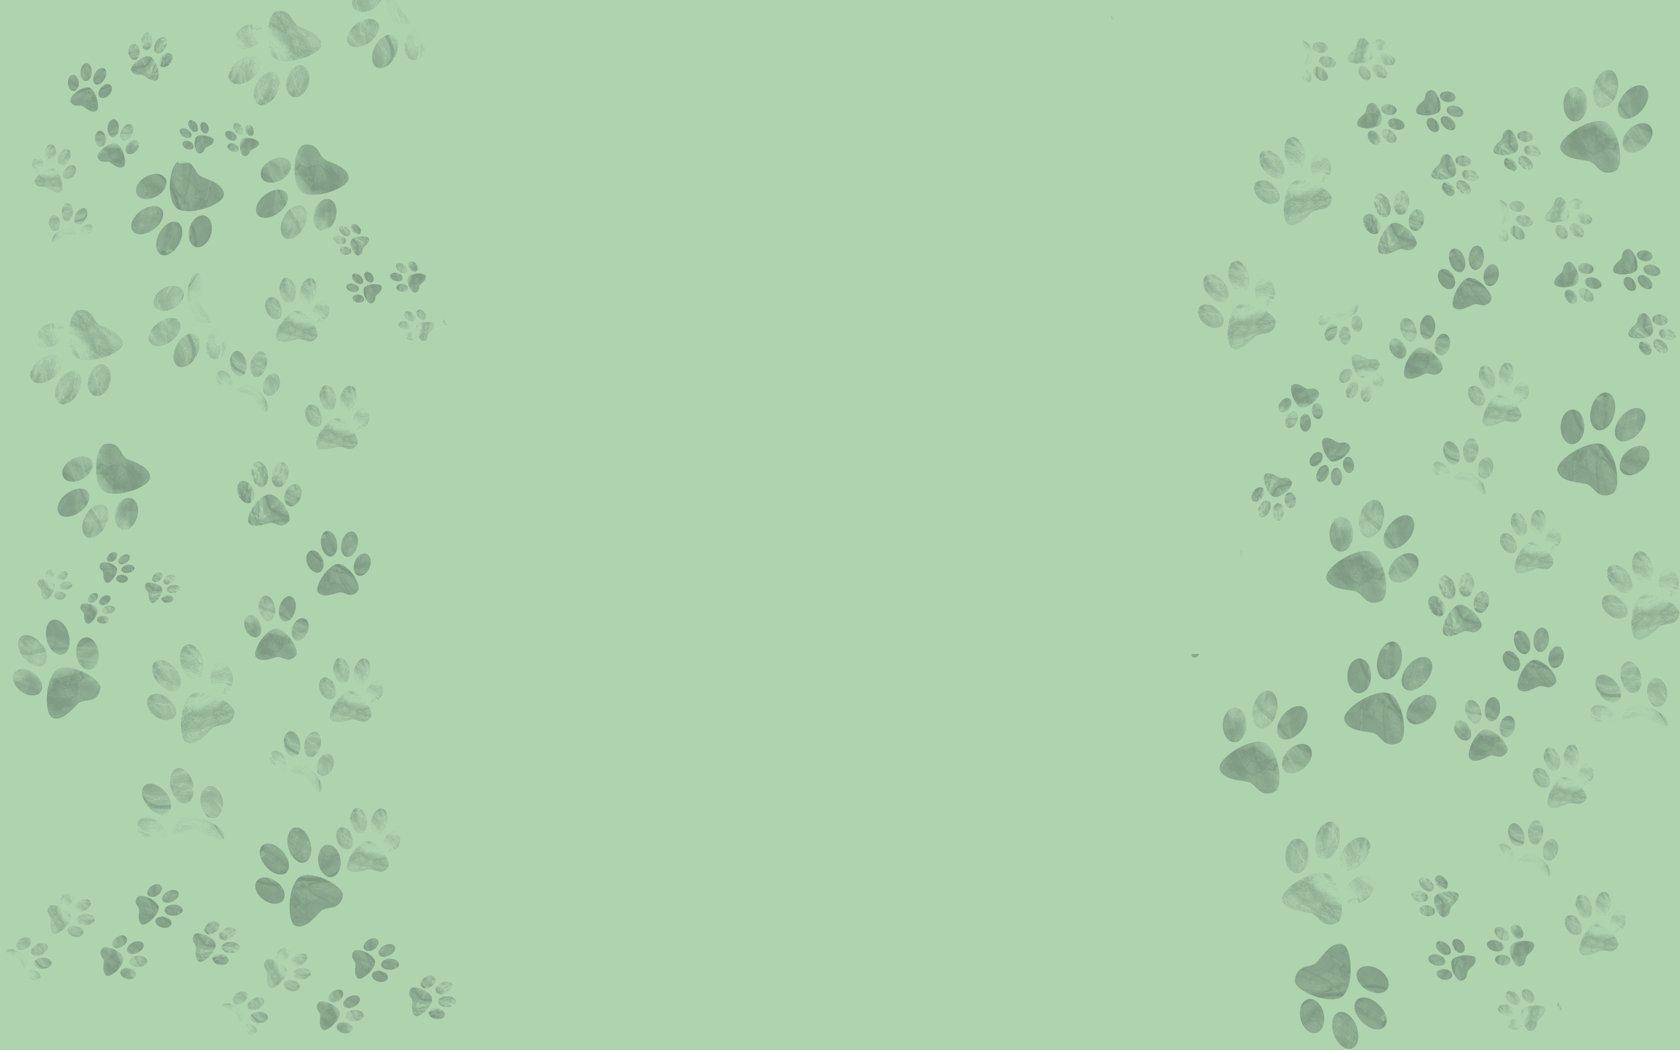 48] Pet Backgrounds and Wallpaper on WallpaperSafari 1680x1050